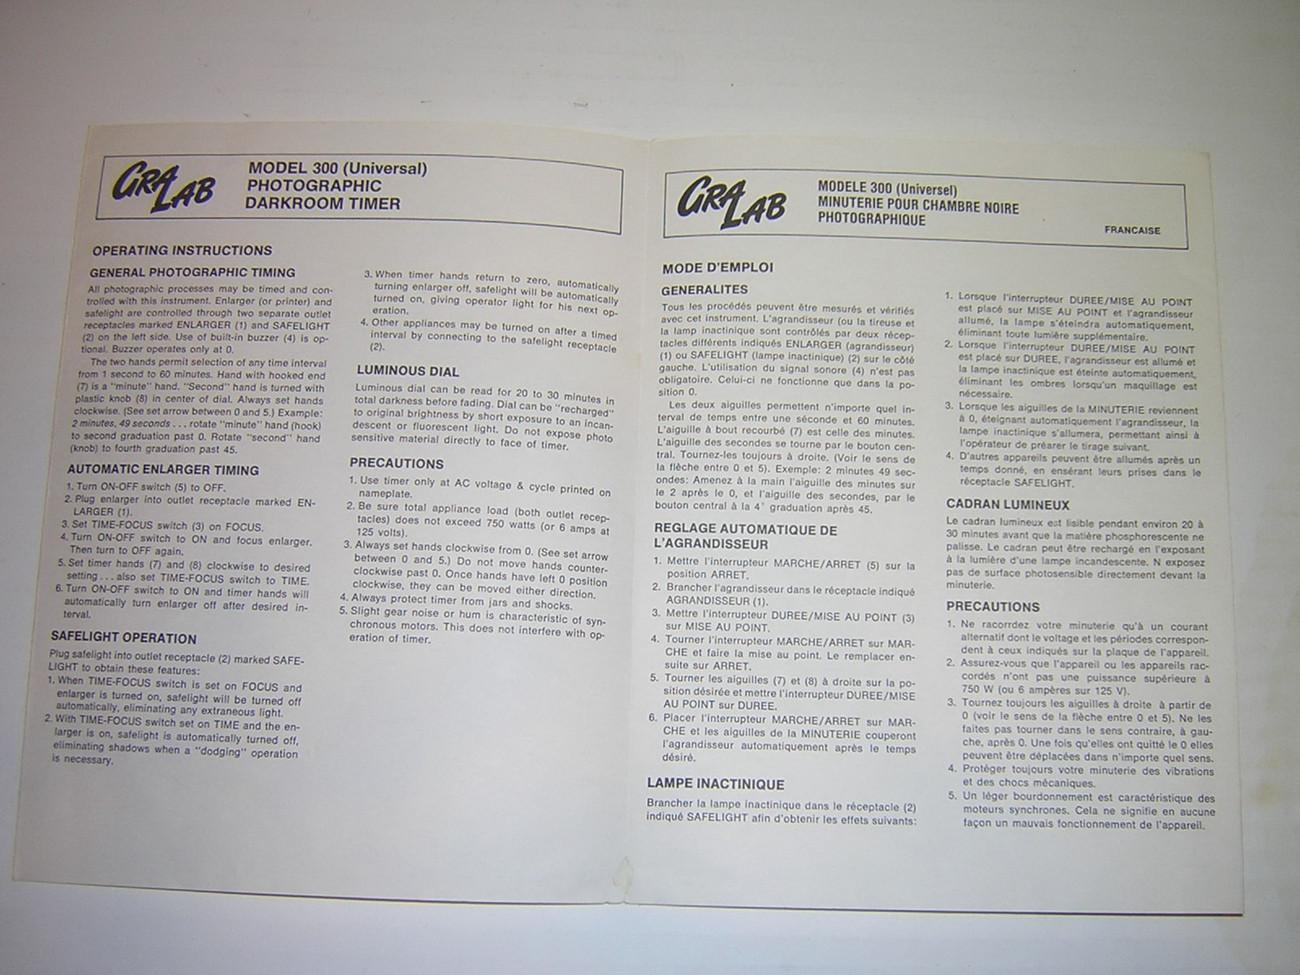 GRA LAB Model 300 Photographic Darkroom Timer Instruction Sheet